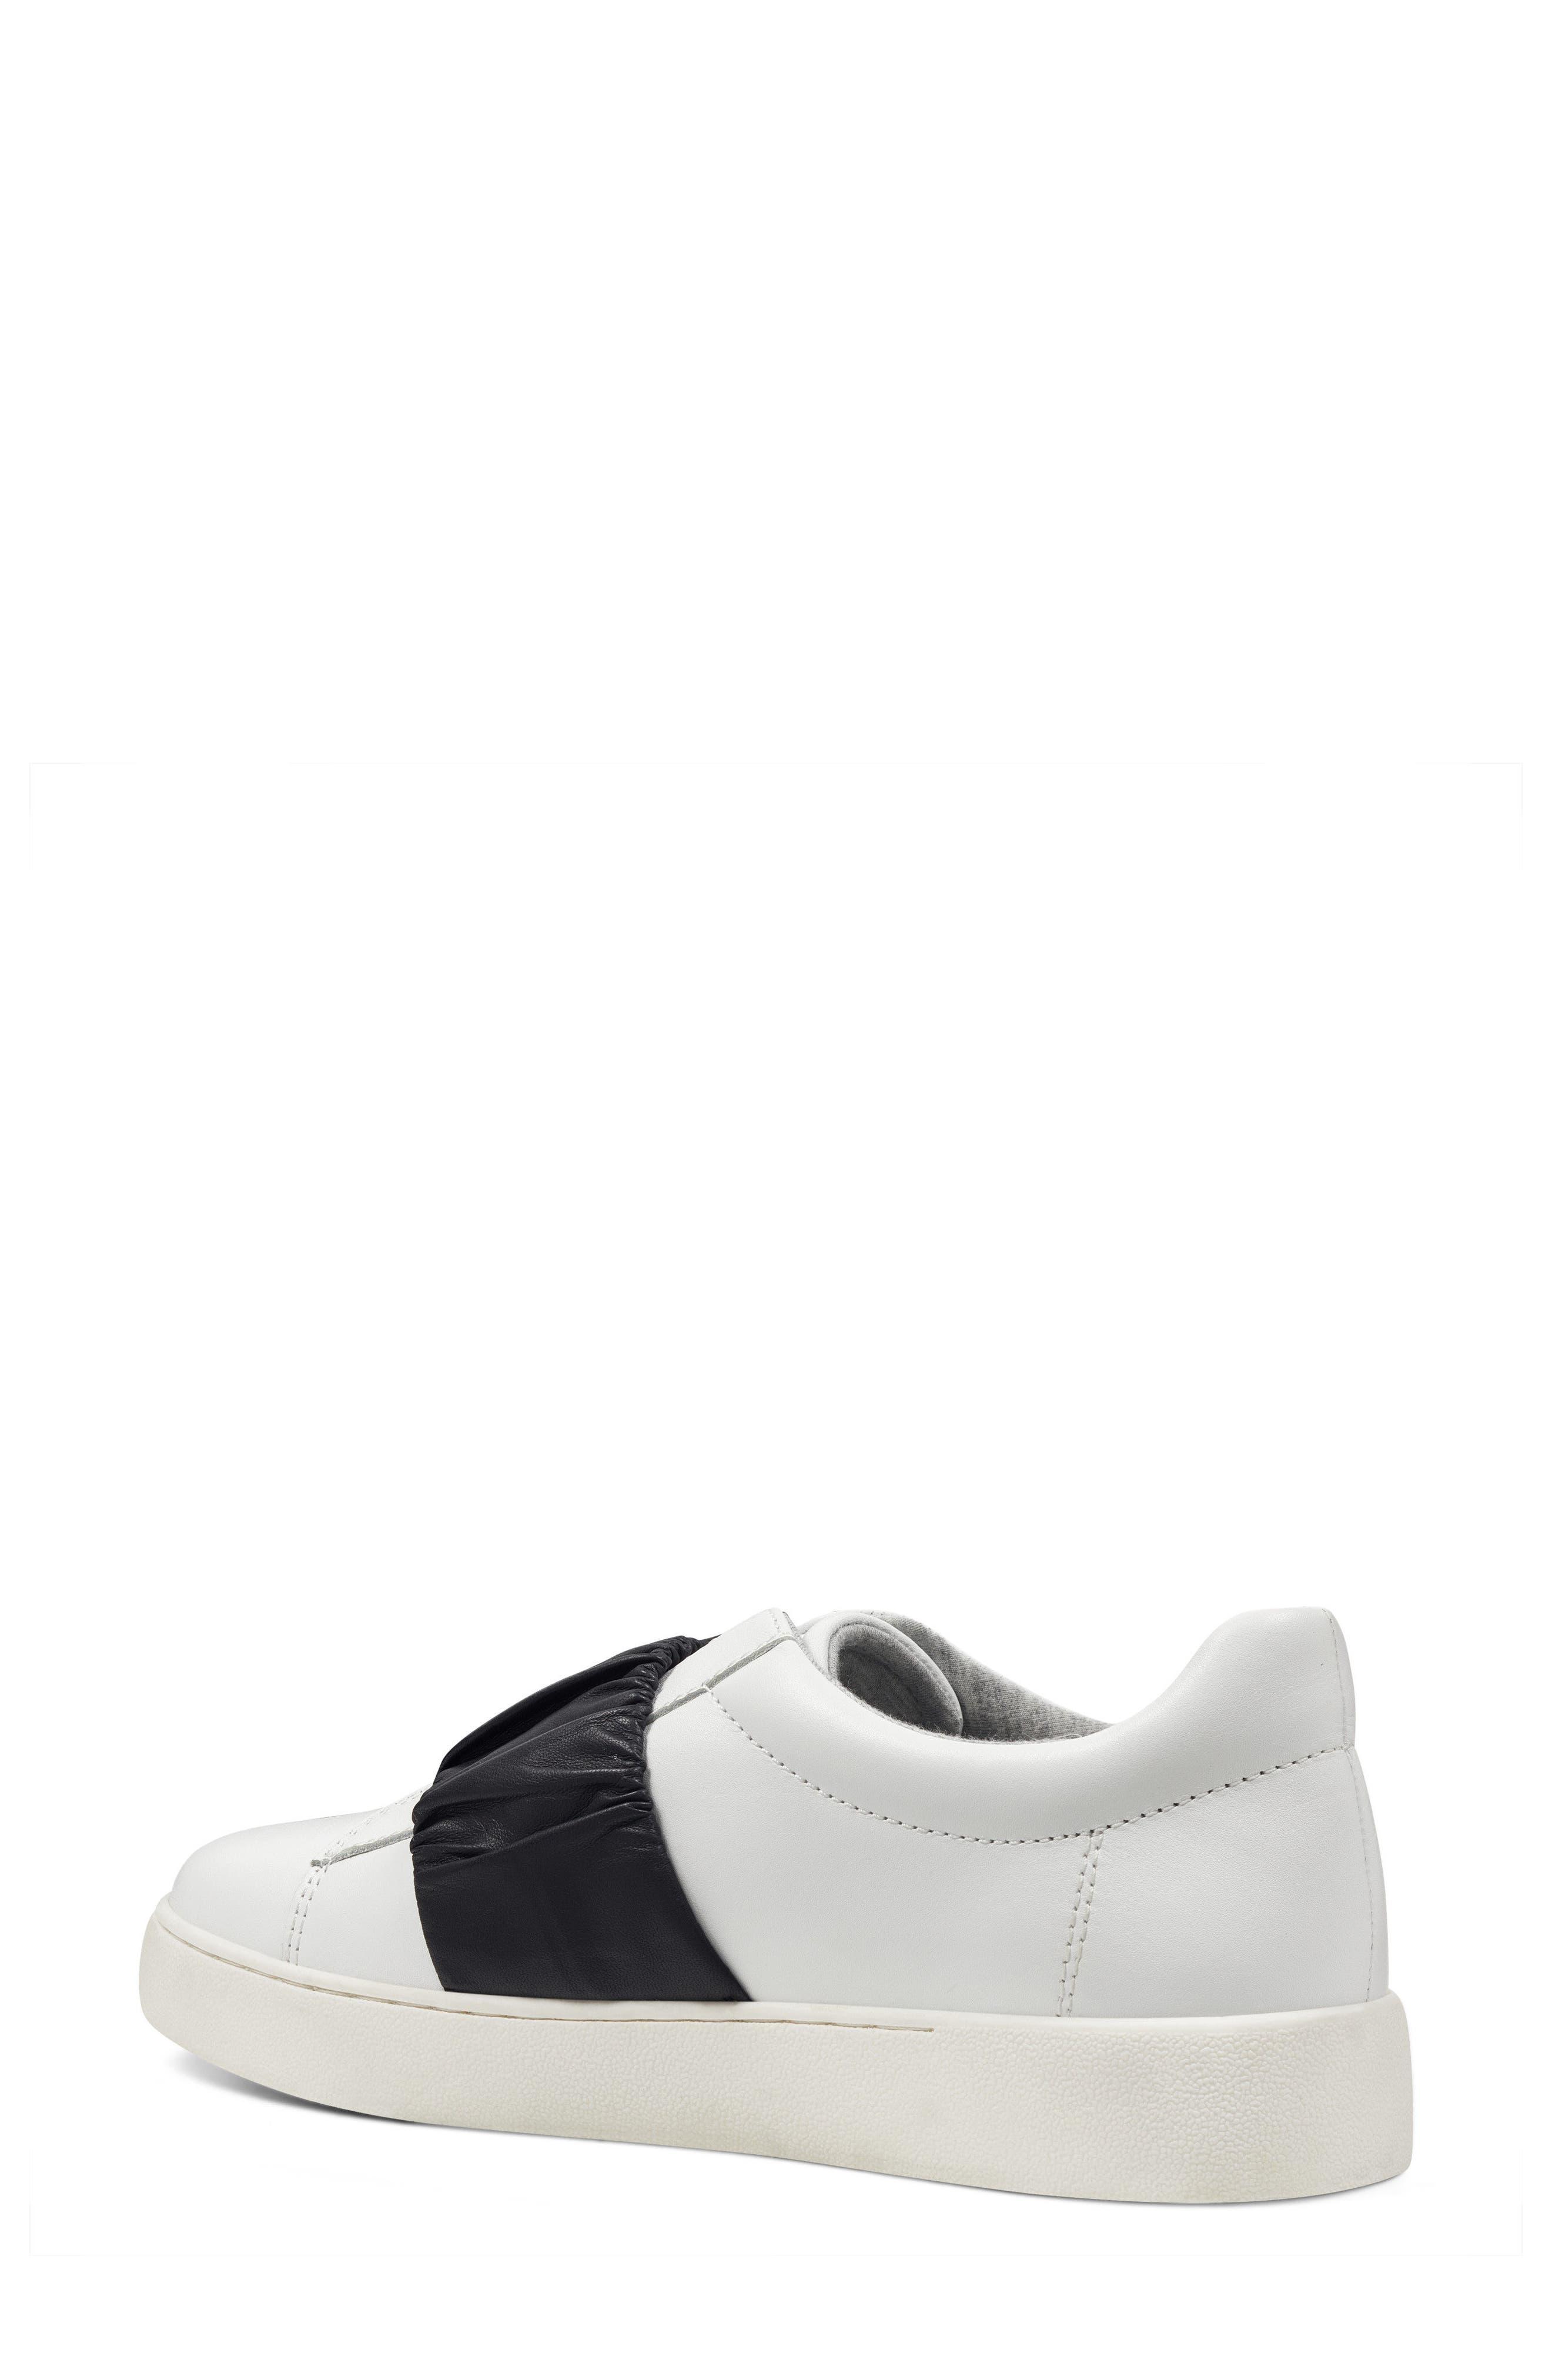 Pindiviah Slip-On Sneaker,                             Alternate thumbnail 2, color,                             White/ Black Leather